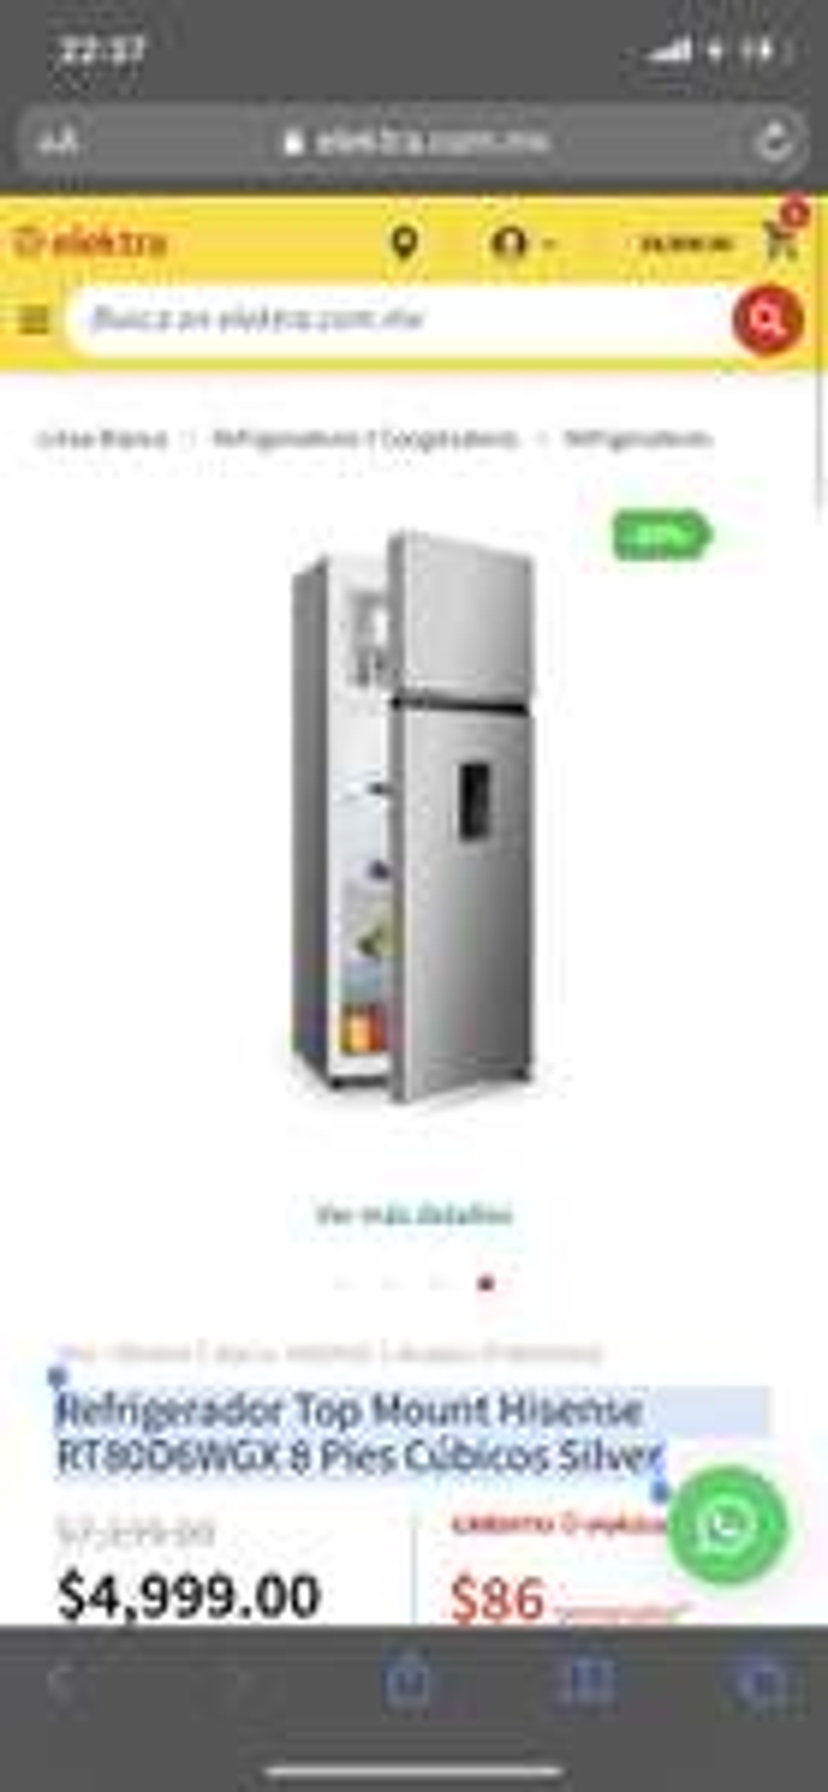 Elektra: Refrigerador Hisense 8 pies